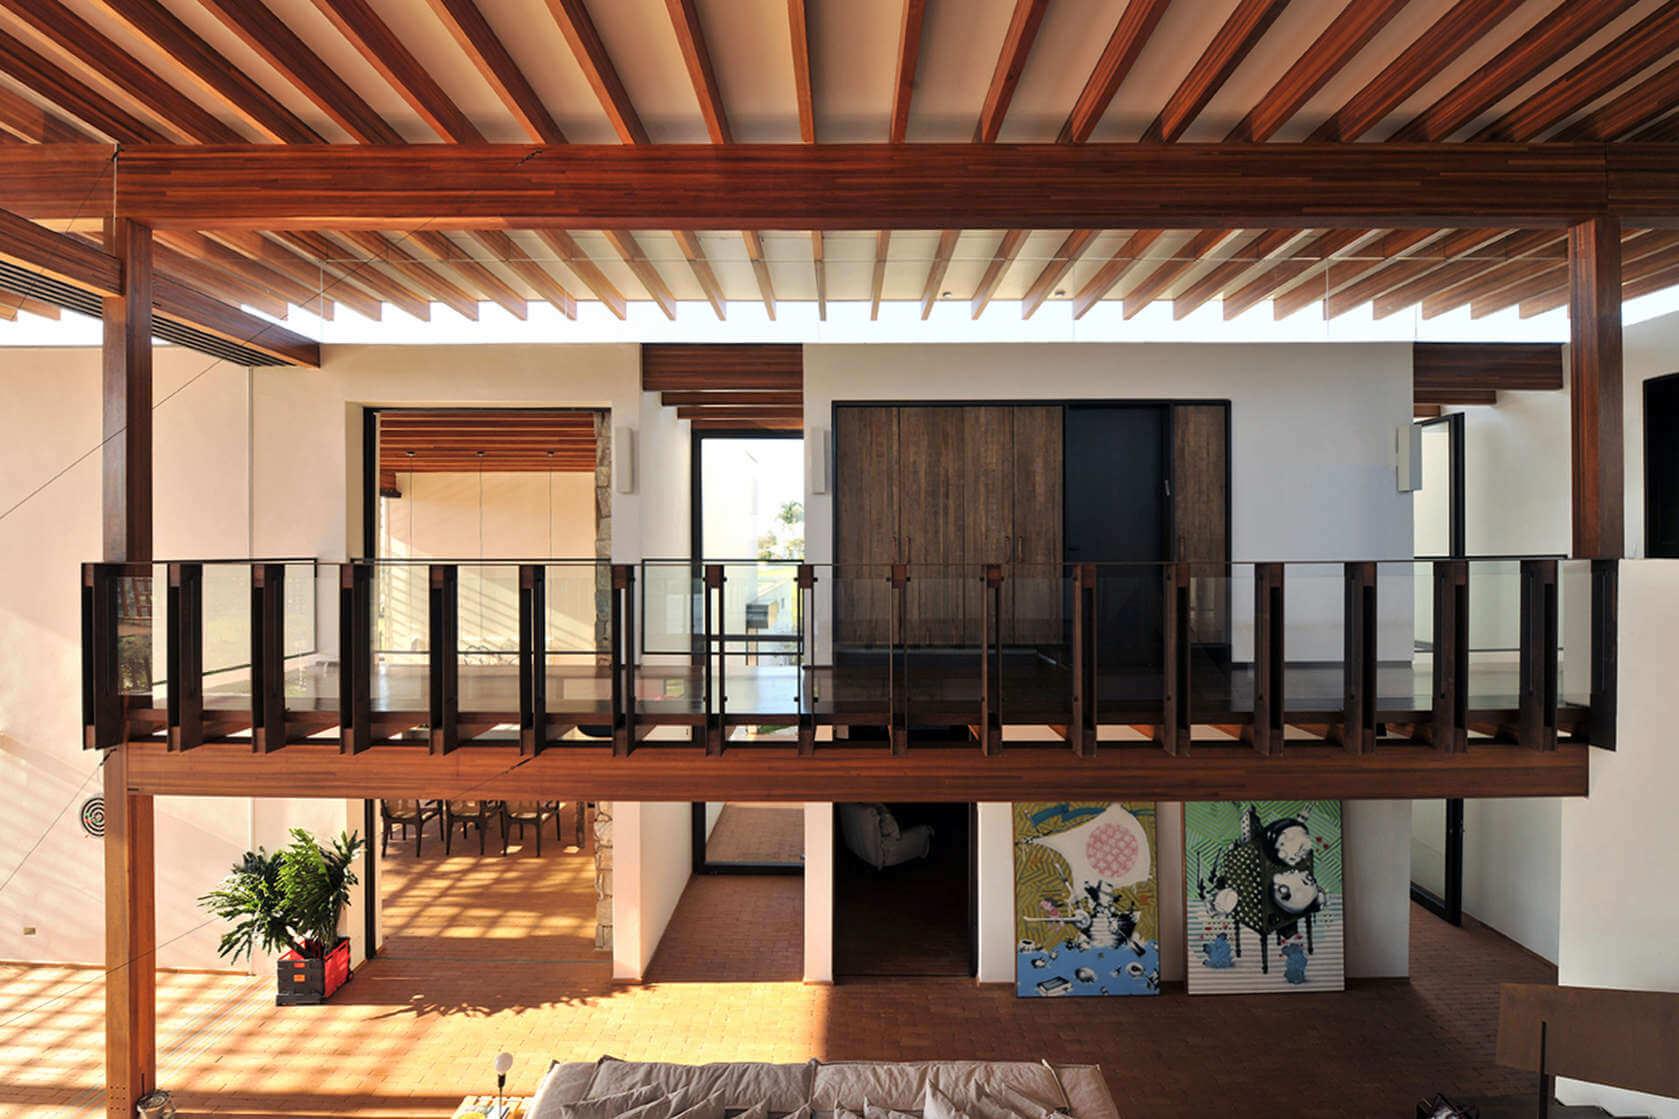 quinta-da-baroneza-candida-tabet-arquitetura-26